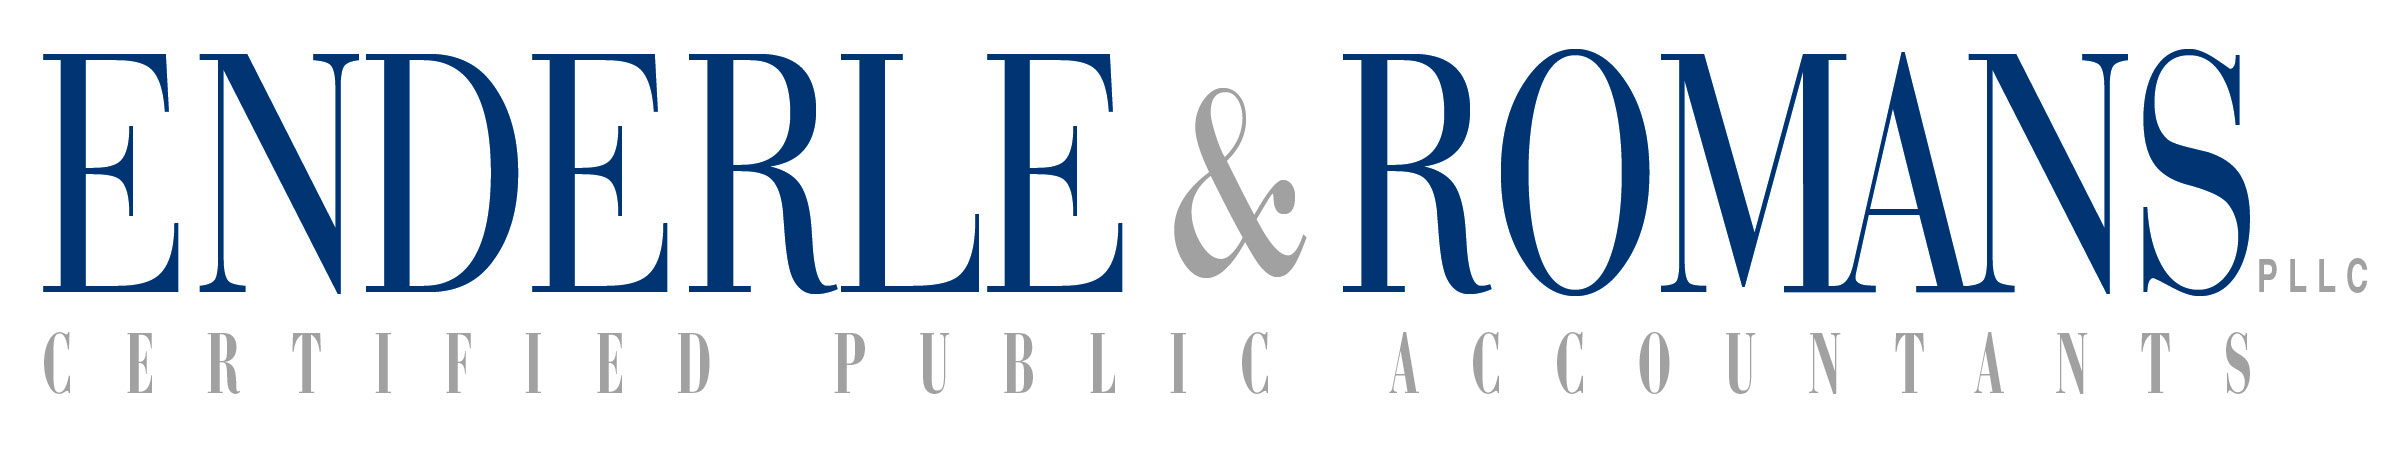 Mark G. Enderle, CPA Logo